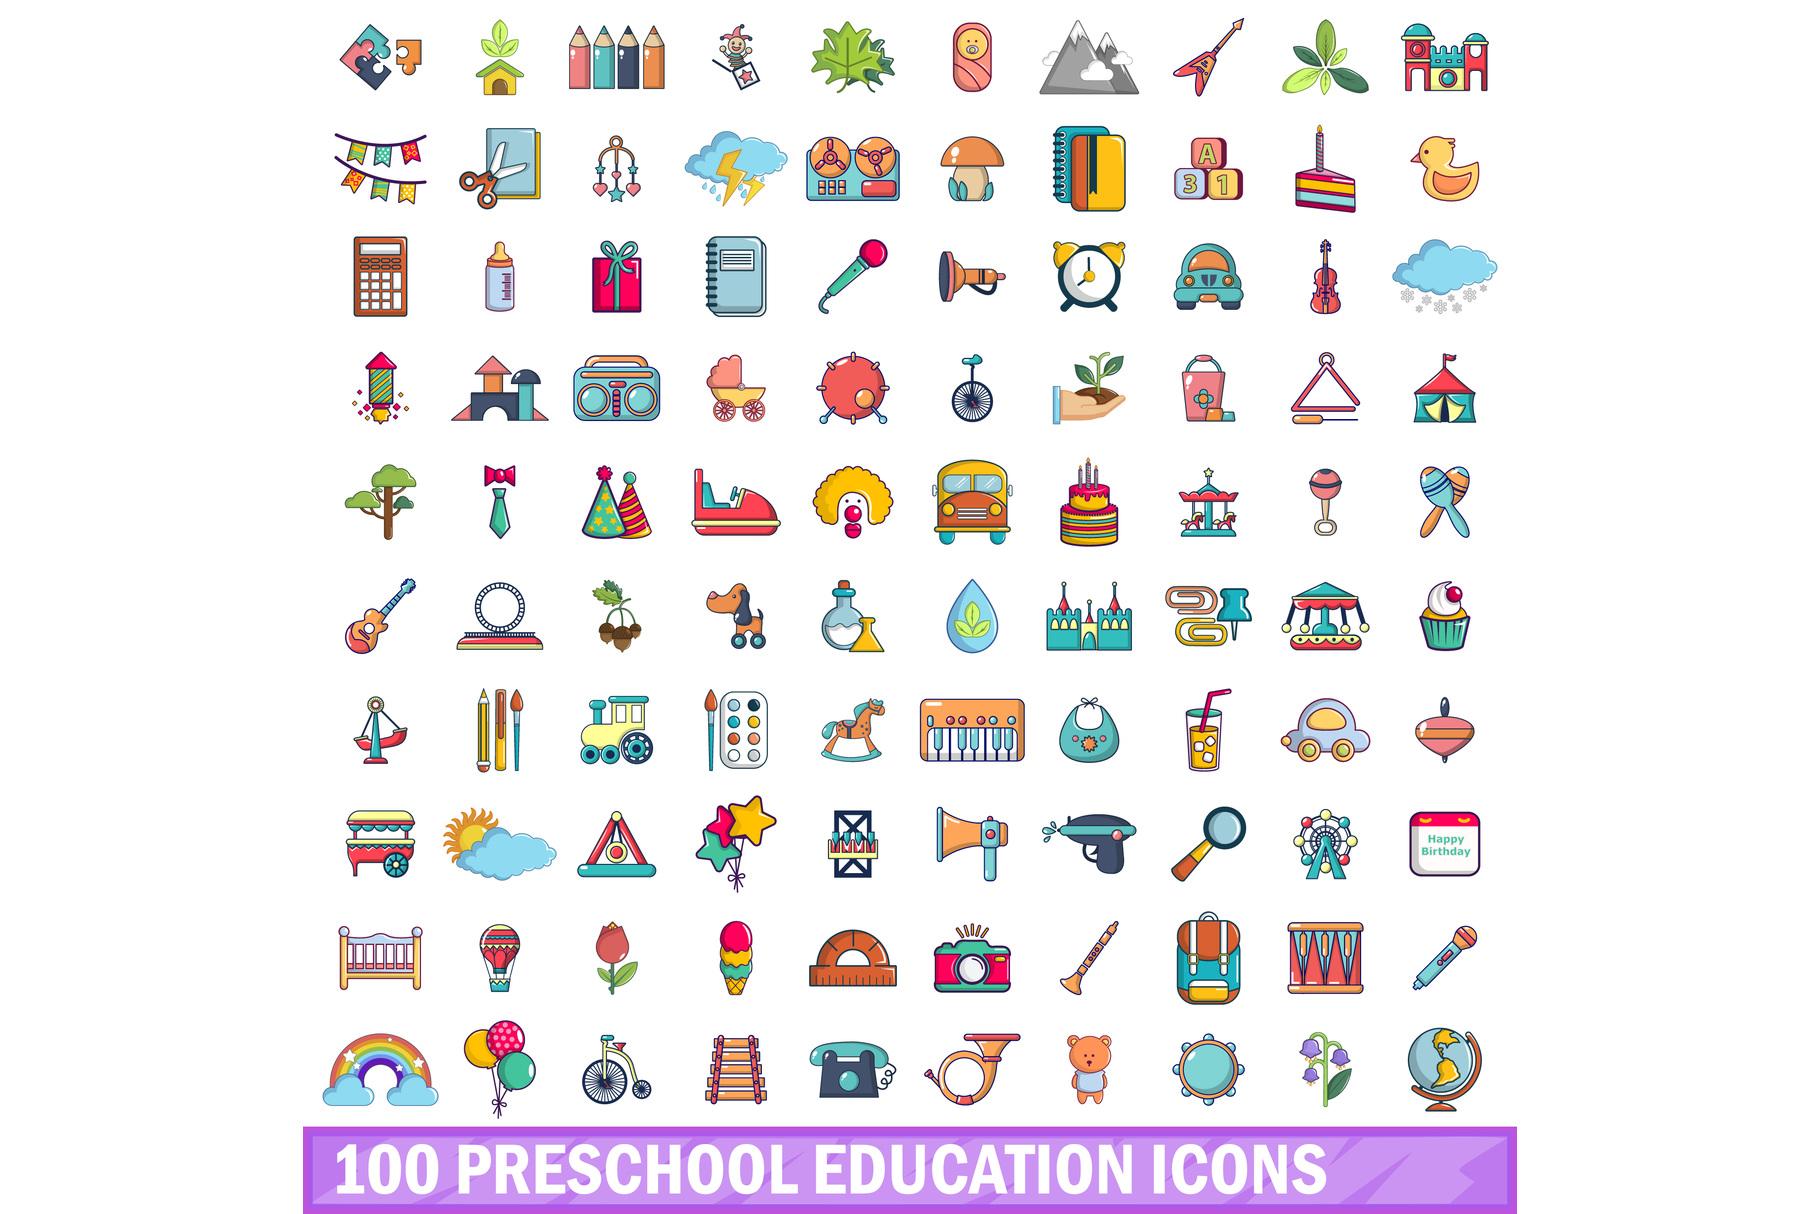 100 preschool education icons set, cartoon style example image 1